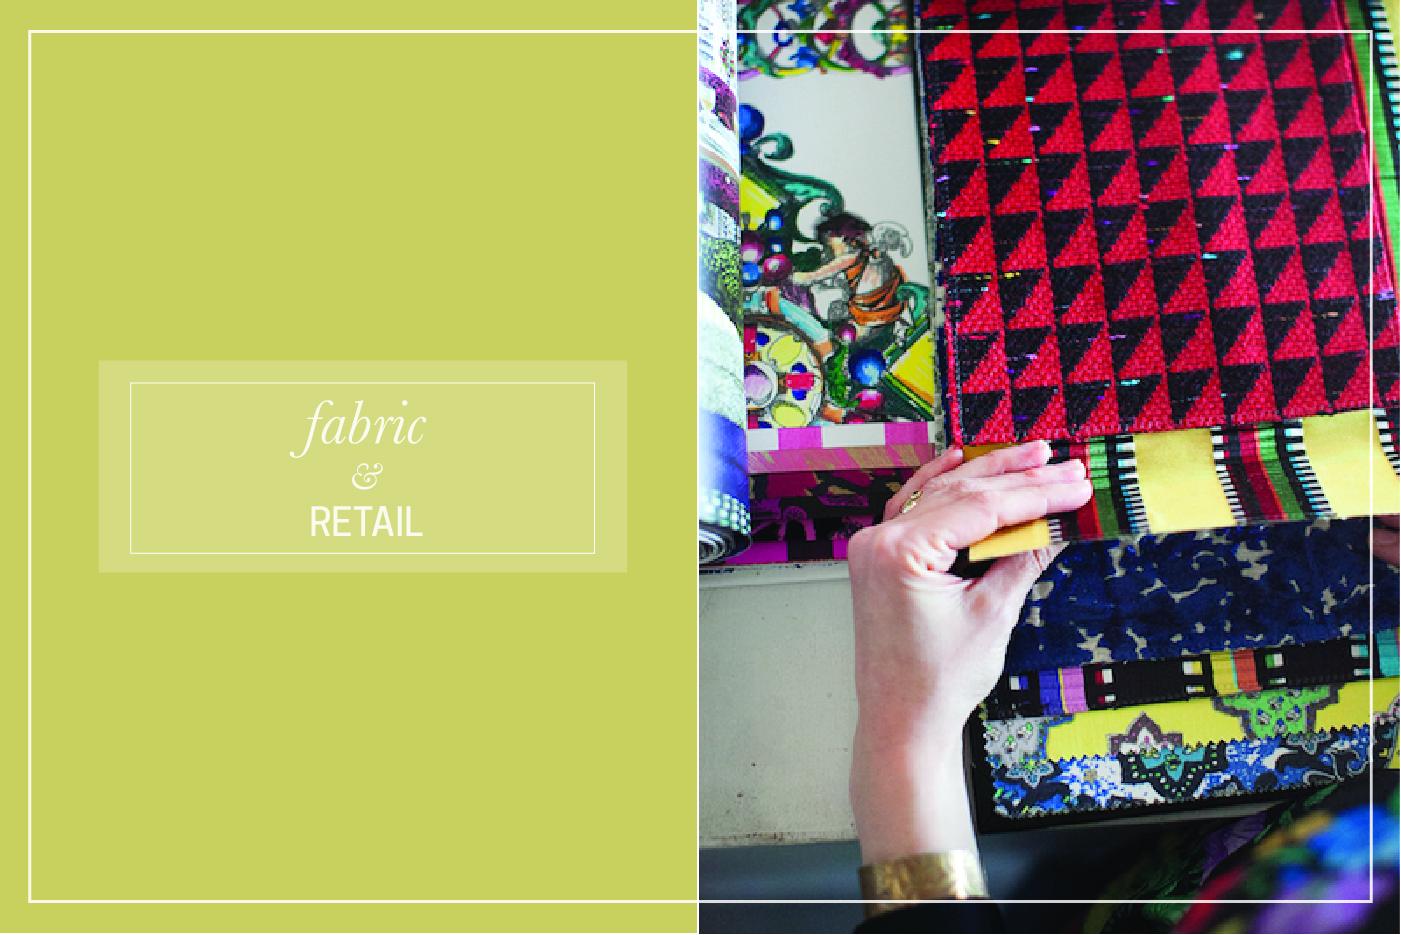 Fabric & Retail